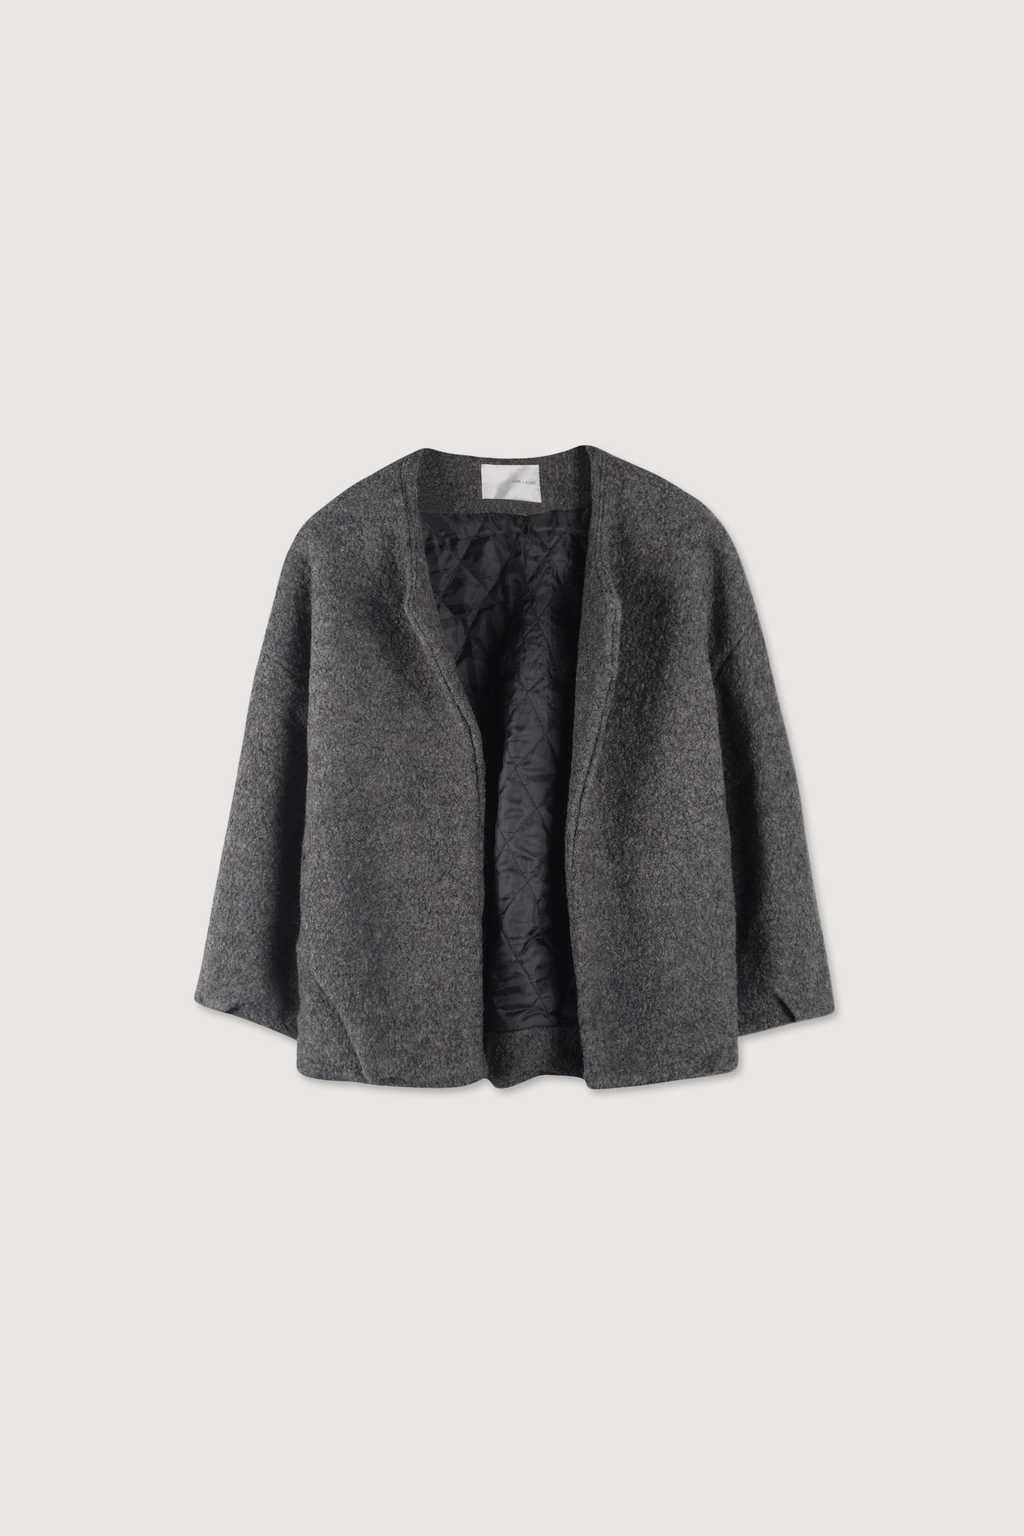 Jacket H177 Dark Gray 5